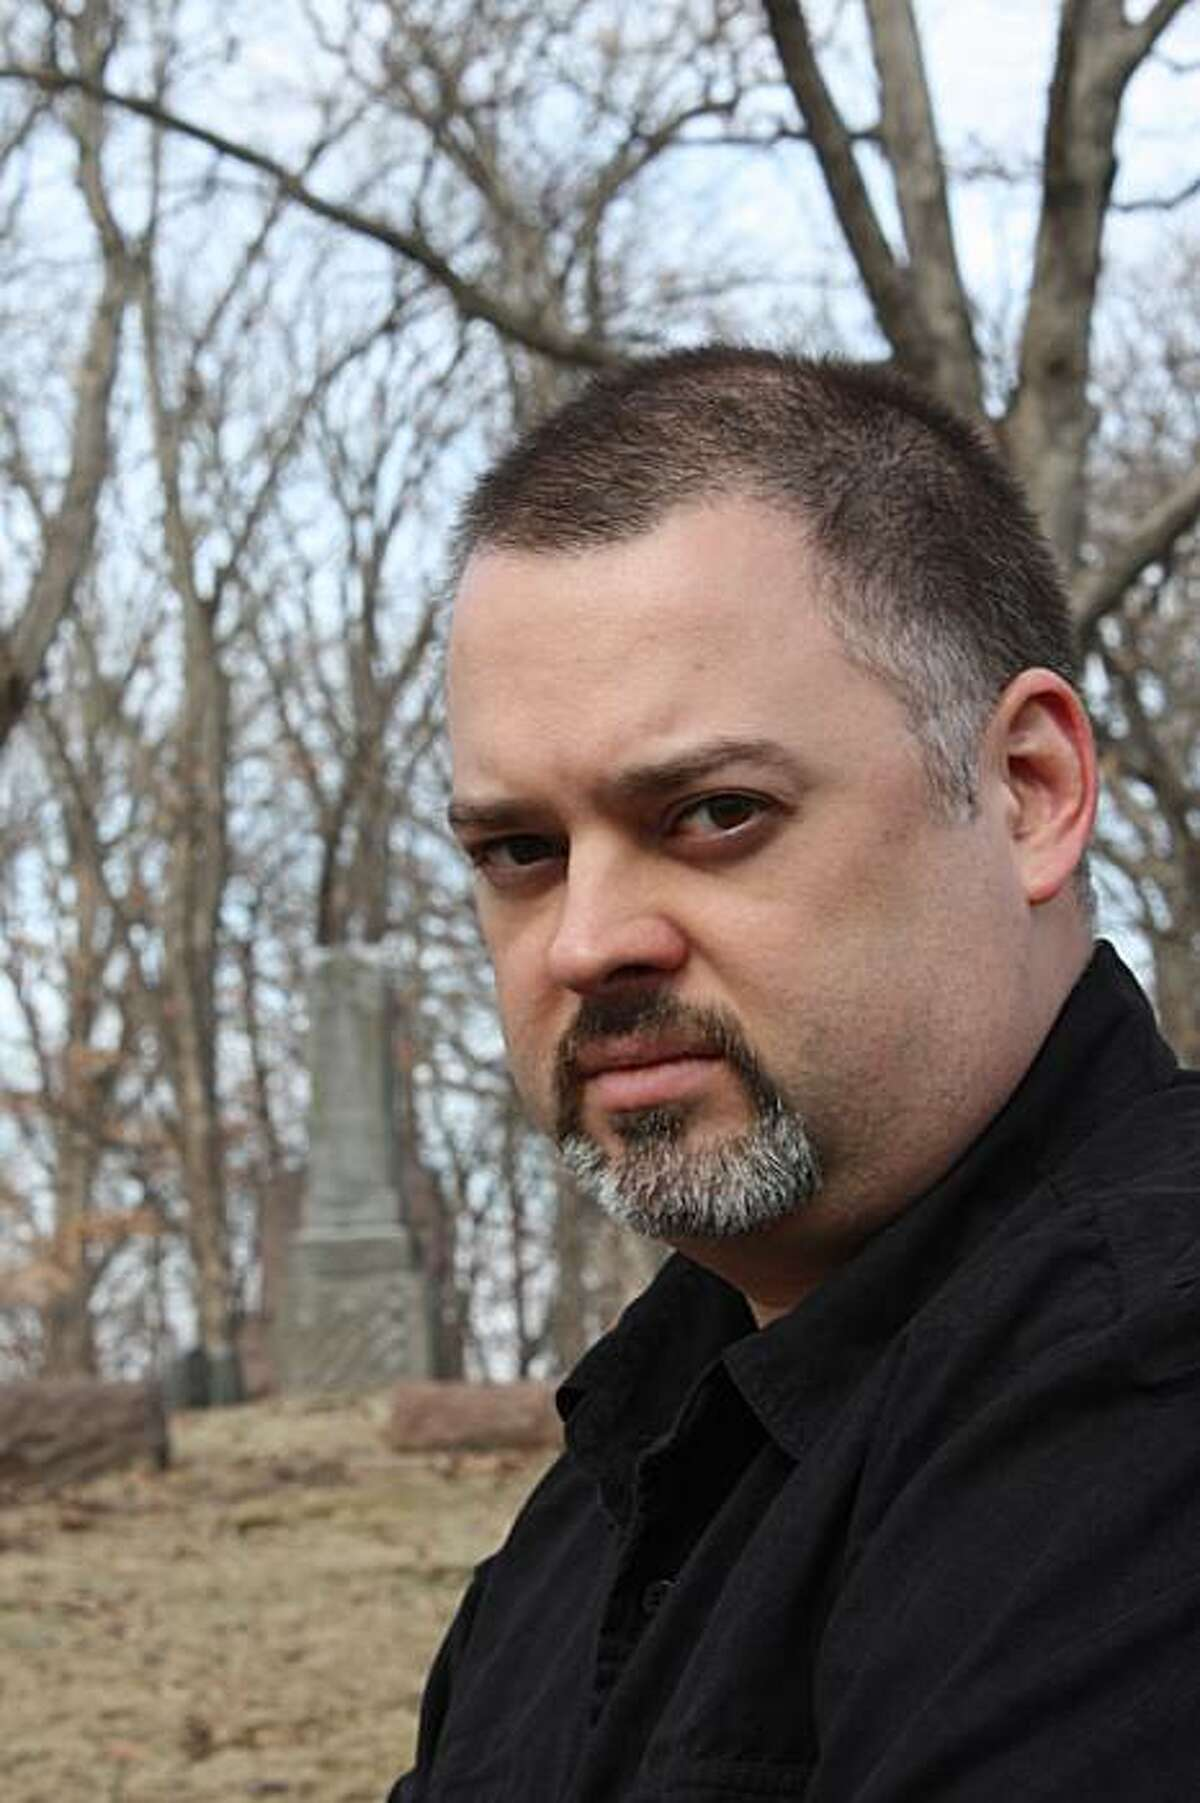 Author Mike Oliveri